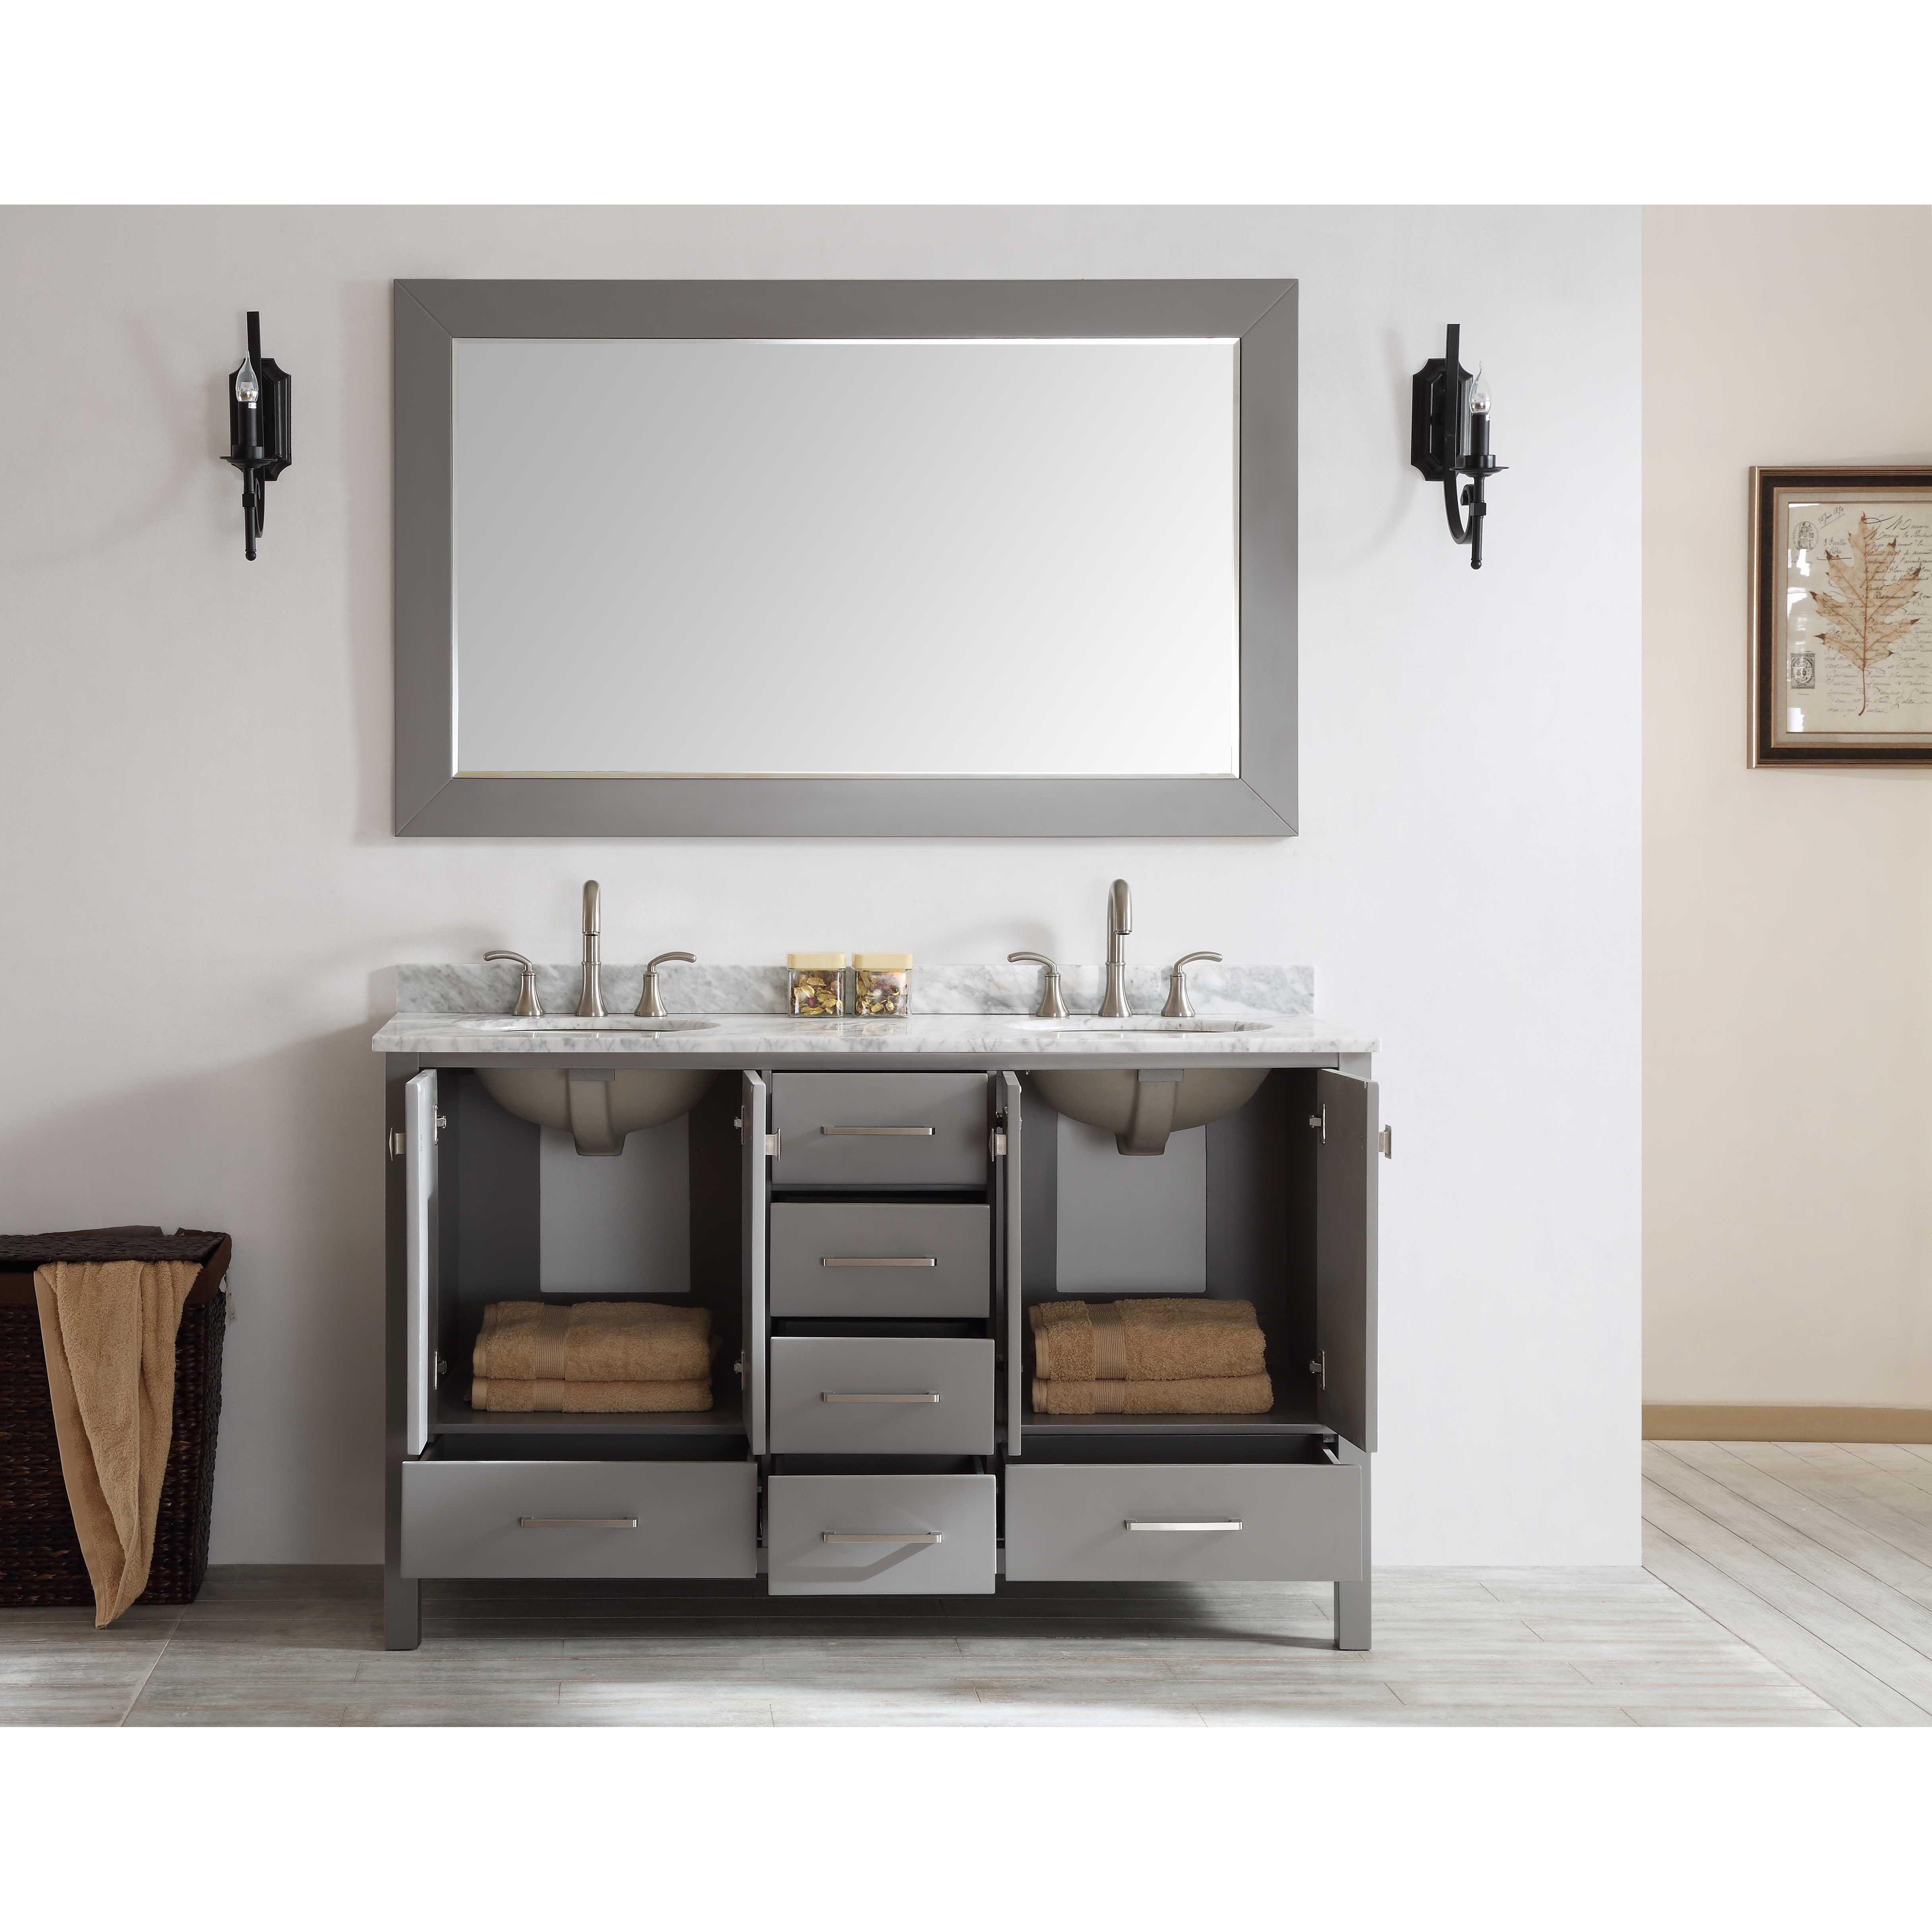 Just Cabinets Aberdeen Eviva Aberdeen 60 Double Bathroom Vanity Set Reviews Wayfair